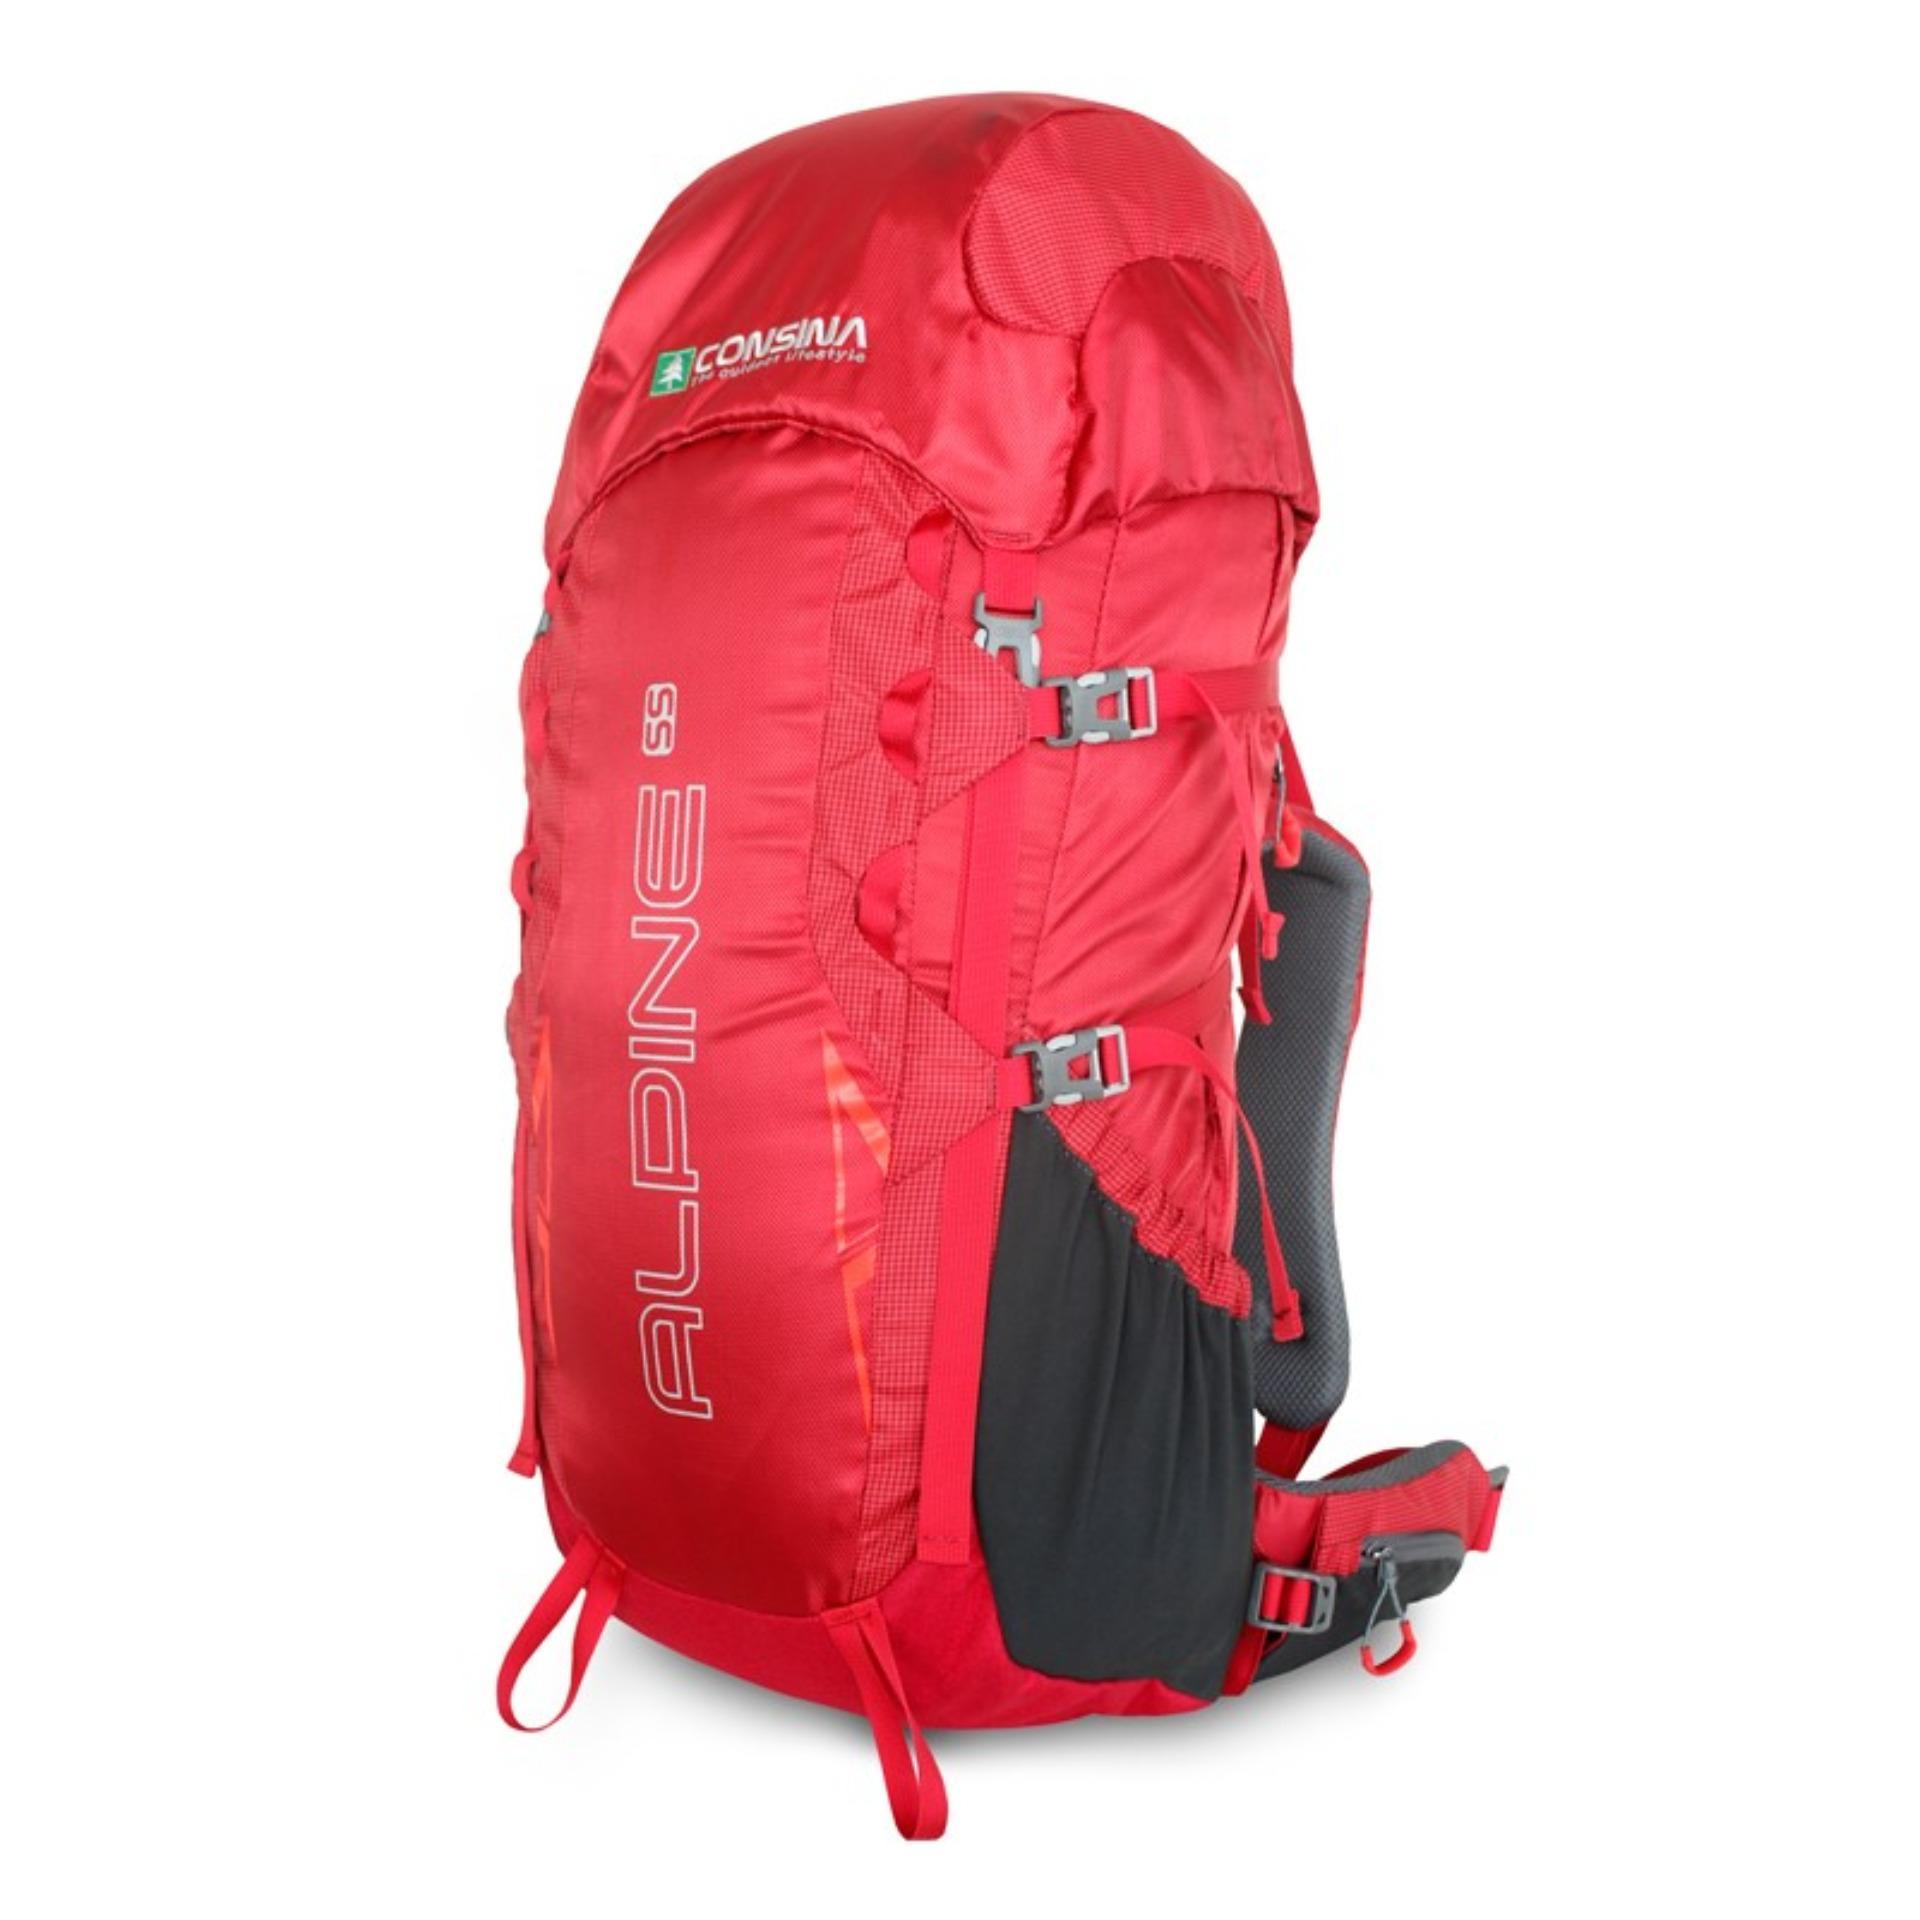 CONSINA ALPINE 55 L Backpack/Ransel/Tas Gunung/Carier